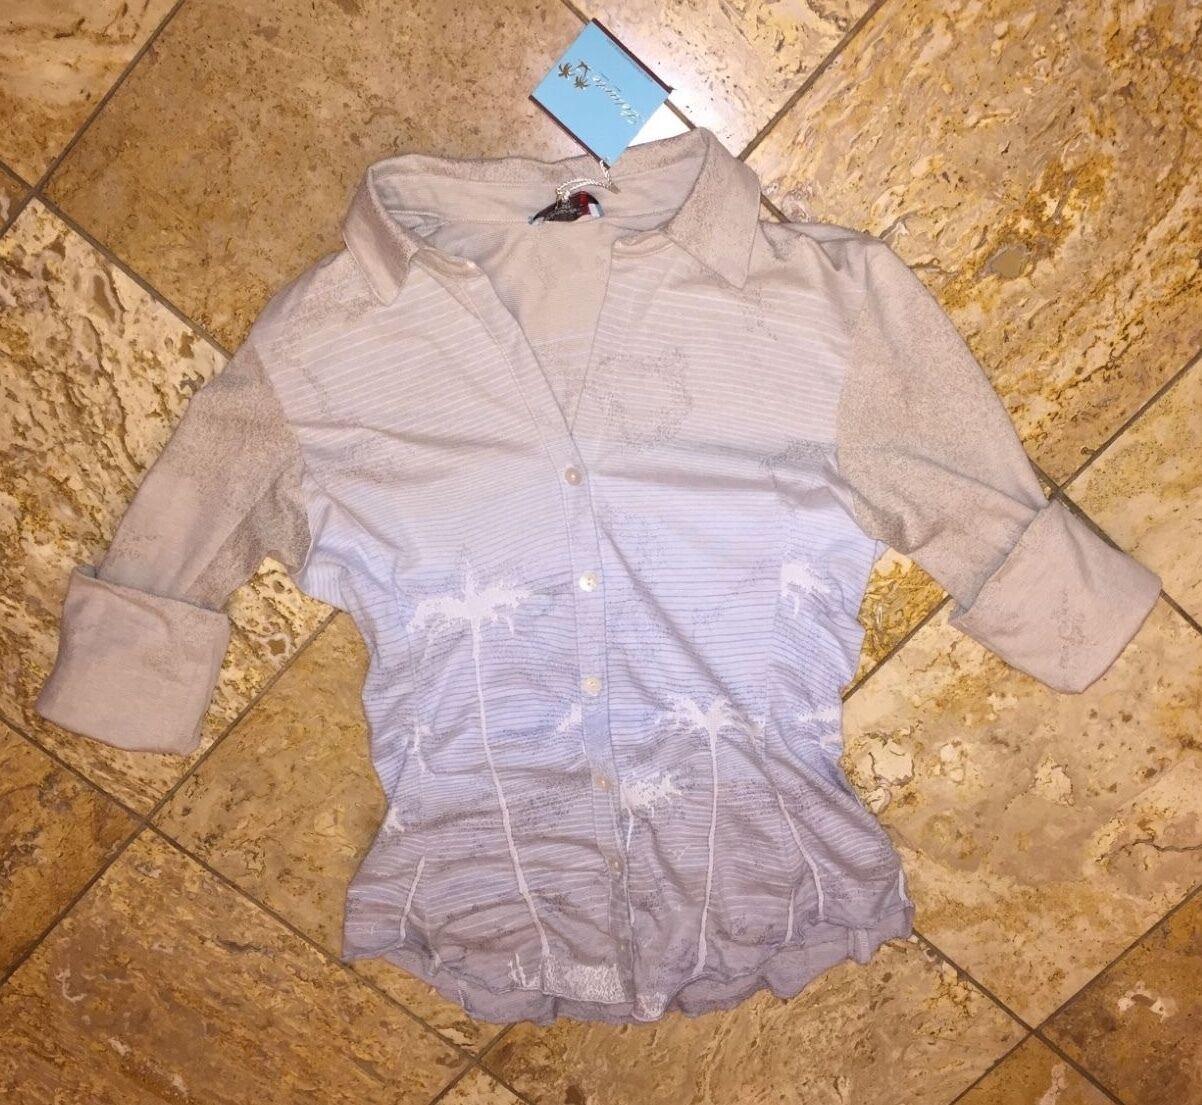 NWT  250 Letarte Ombre Hawaiian Palm Beach Shirt Cover-up Swimsuit Top Women's M